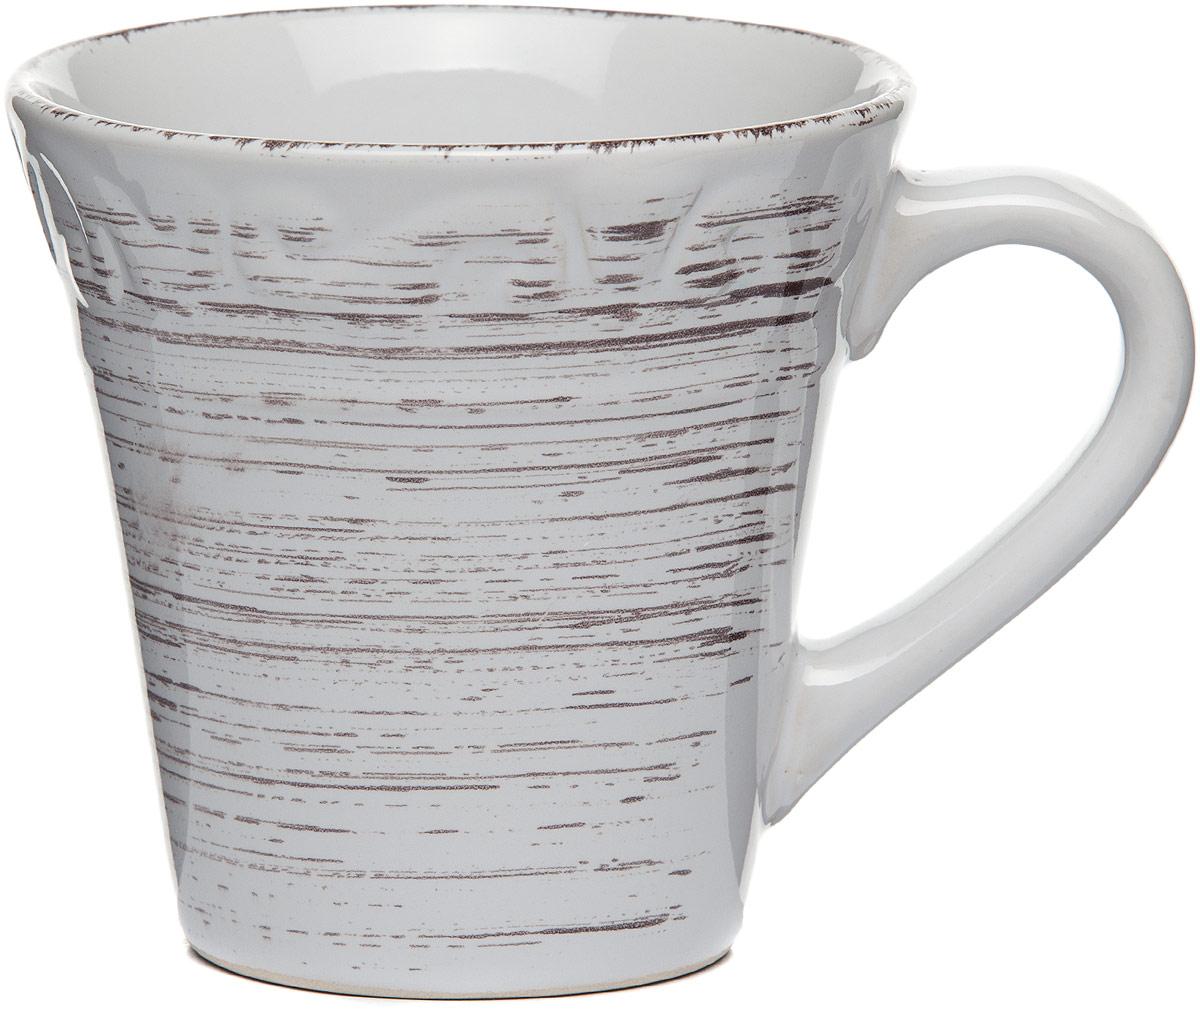 Кружка столовая Gotoff , цвет: белый, 360 мл кружка винтаж 360 мл miolla кружка винтаж 360 мл